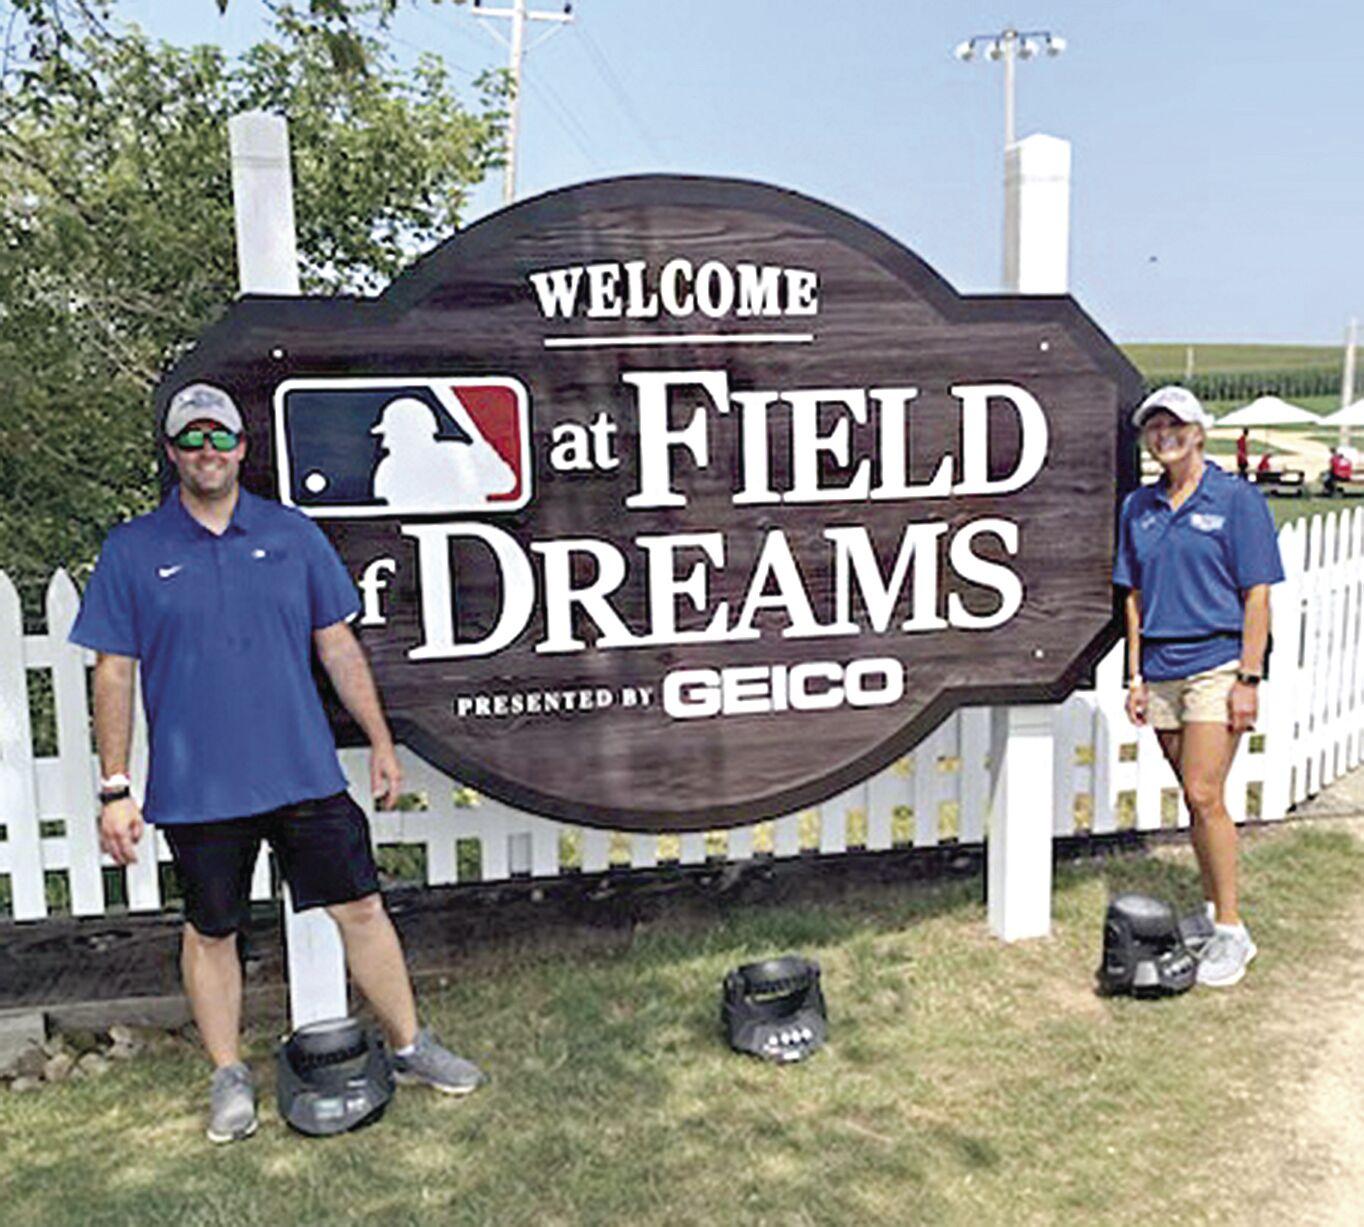 Field of Dreams-sign